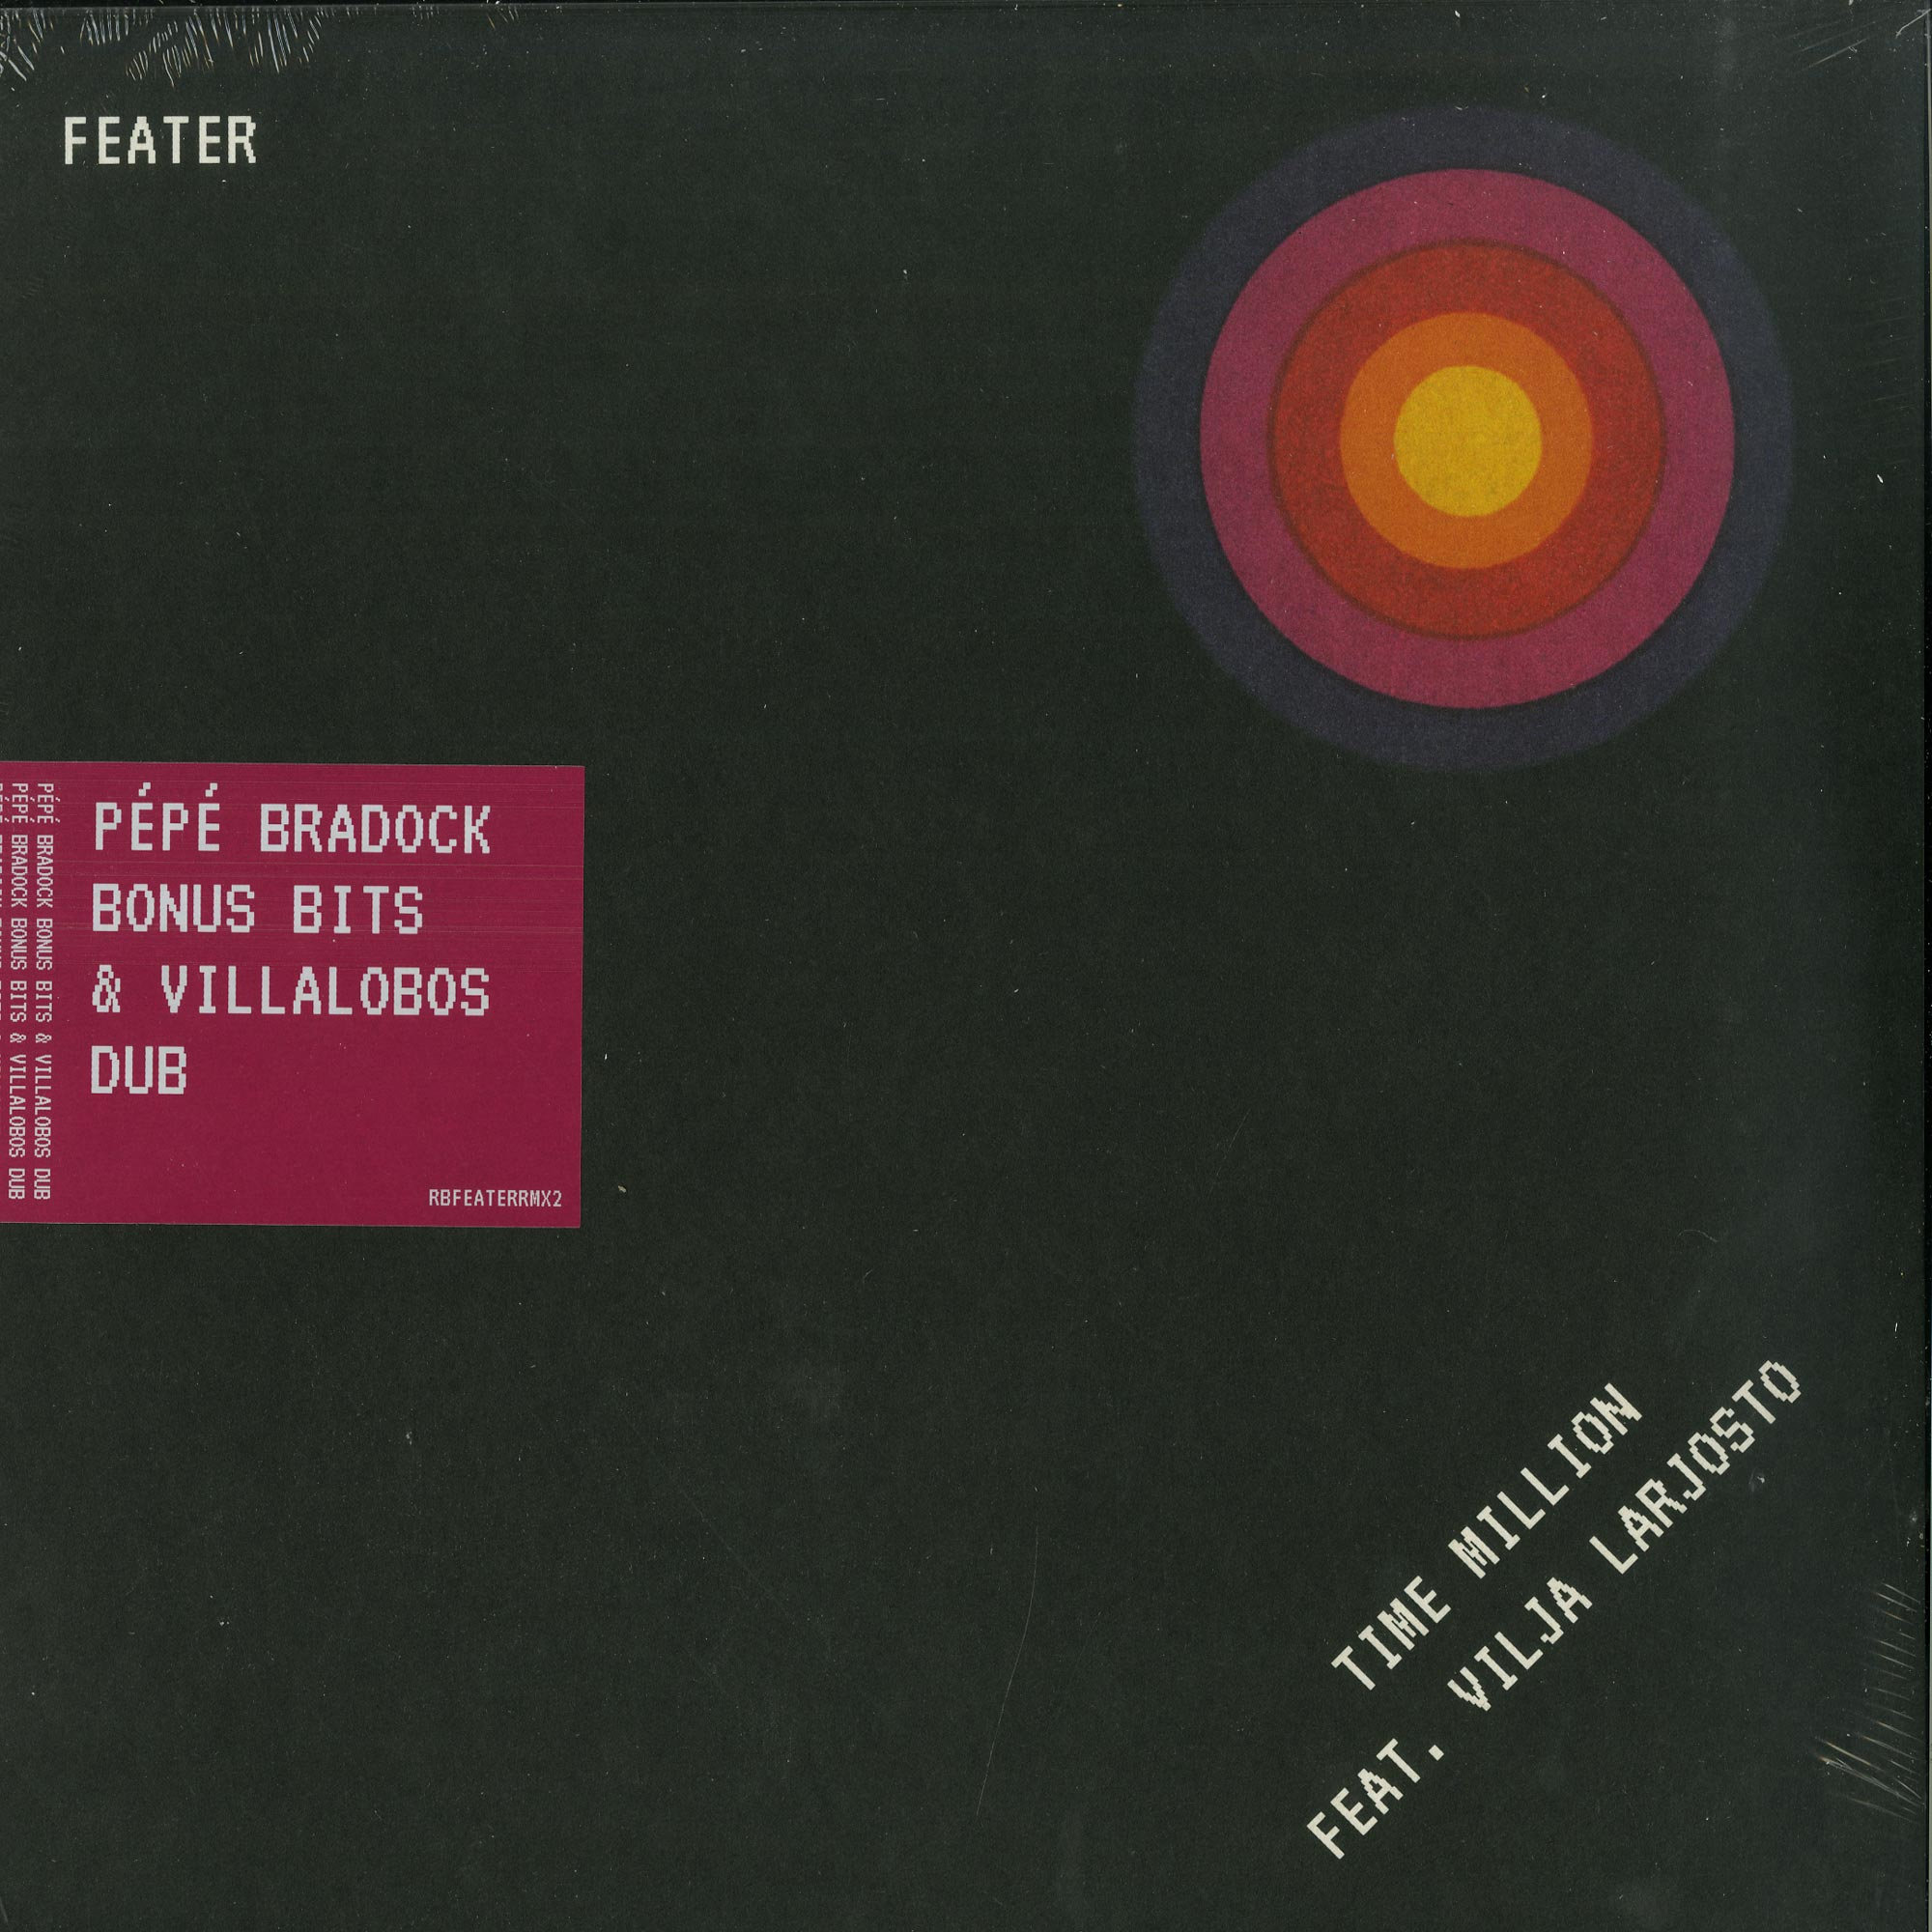 Feater - Time Million feat. Vilja Larjos - PEPE BRADOCK BONUS BIT & VILLALOBOS DUBS